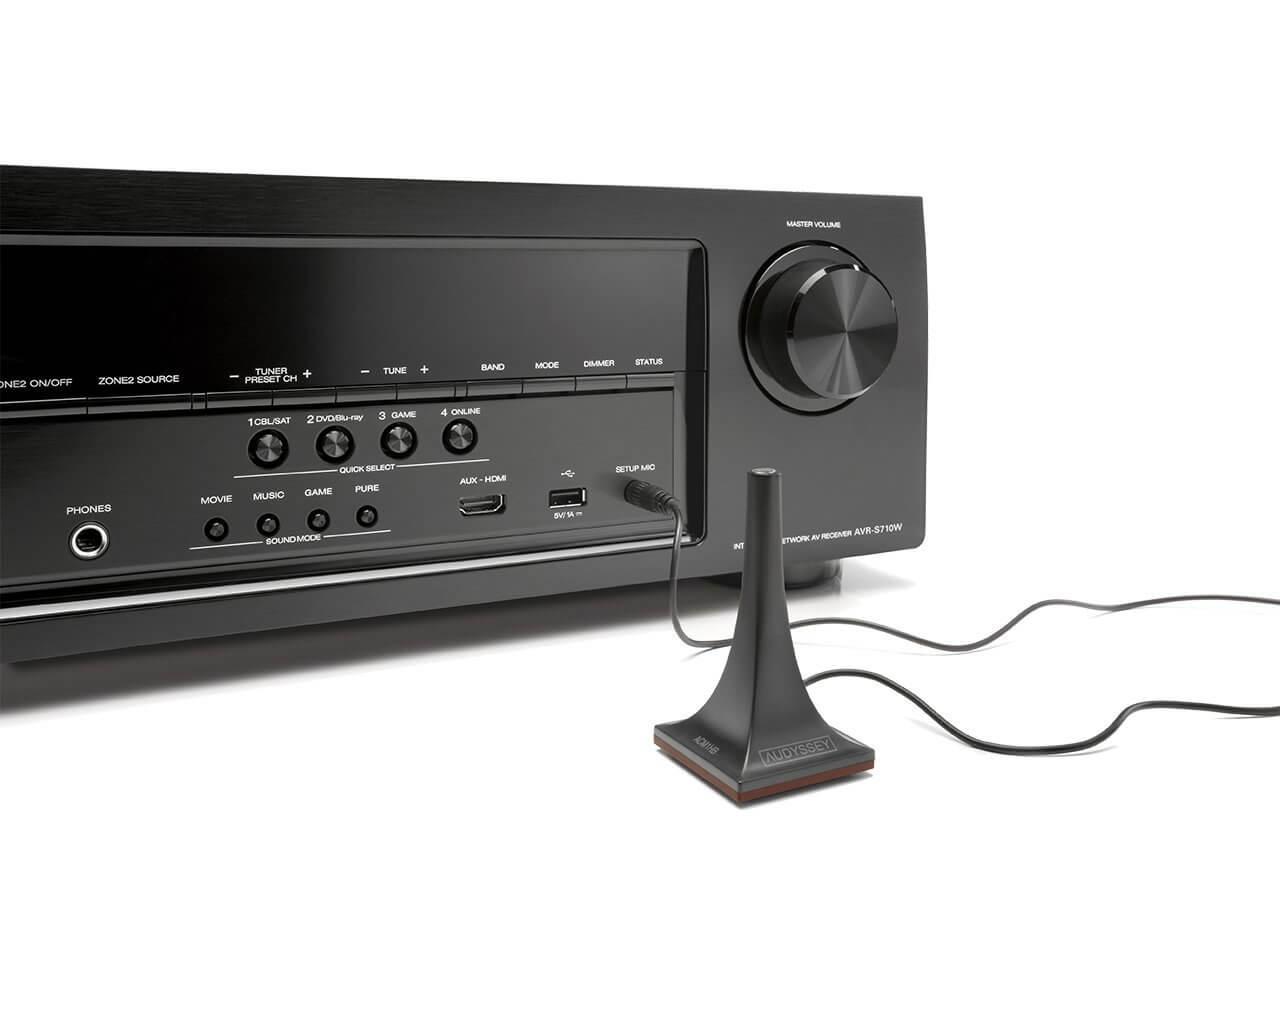 Denon AVR-S710W Review